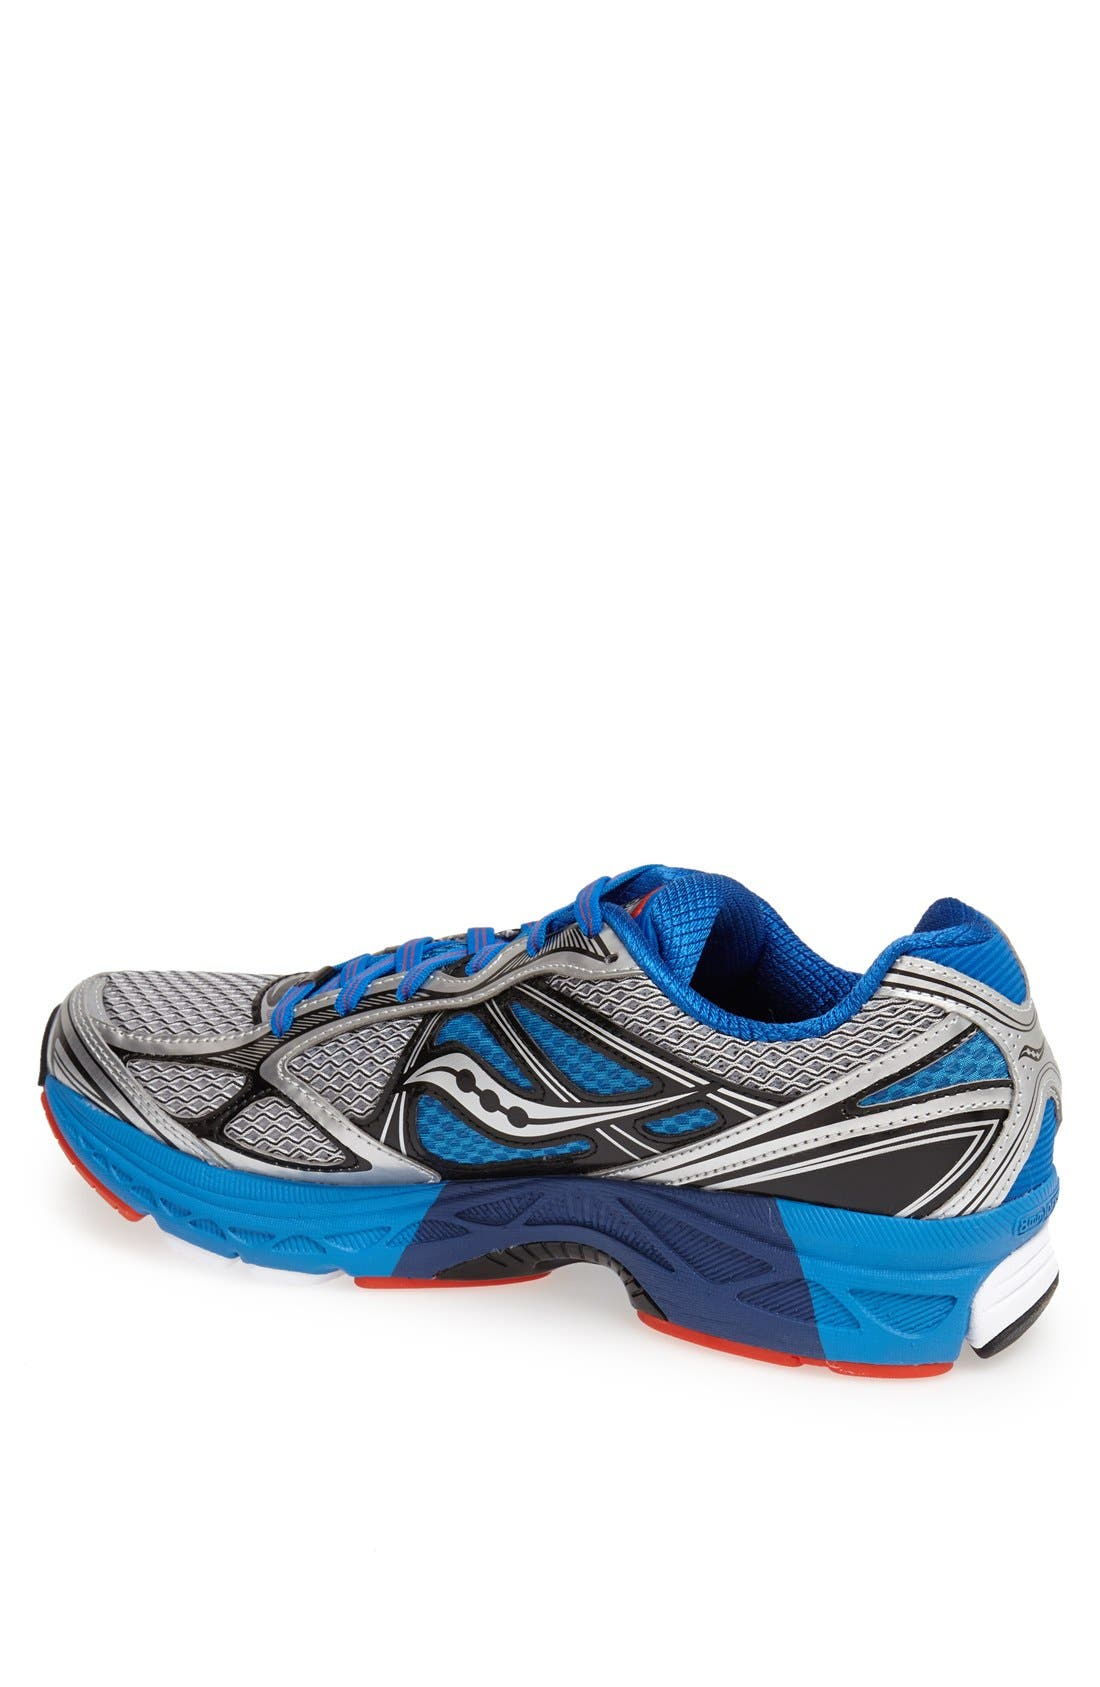 Alternate Image 2  - Saucony 'Guide 7' Running Shoe (Men)